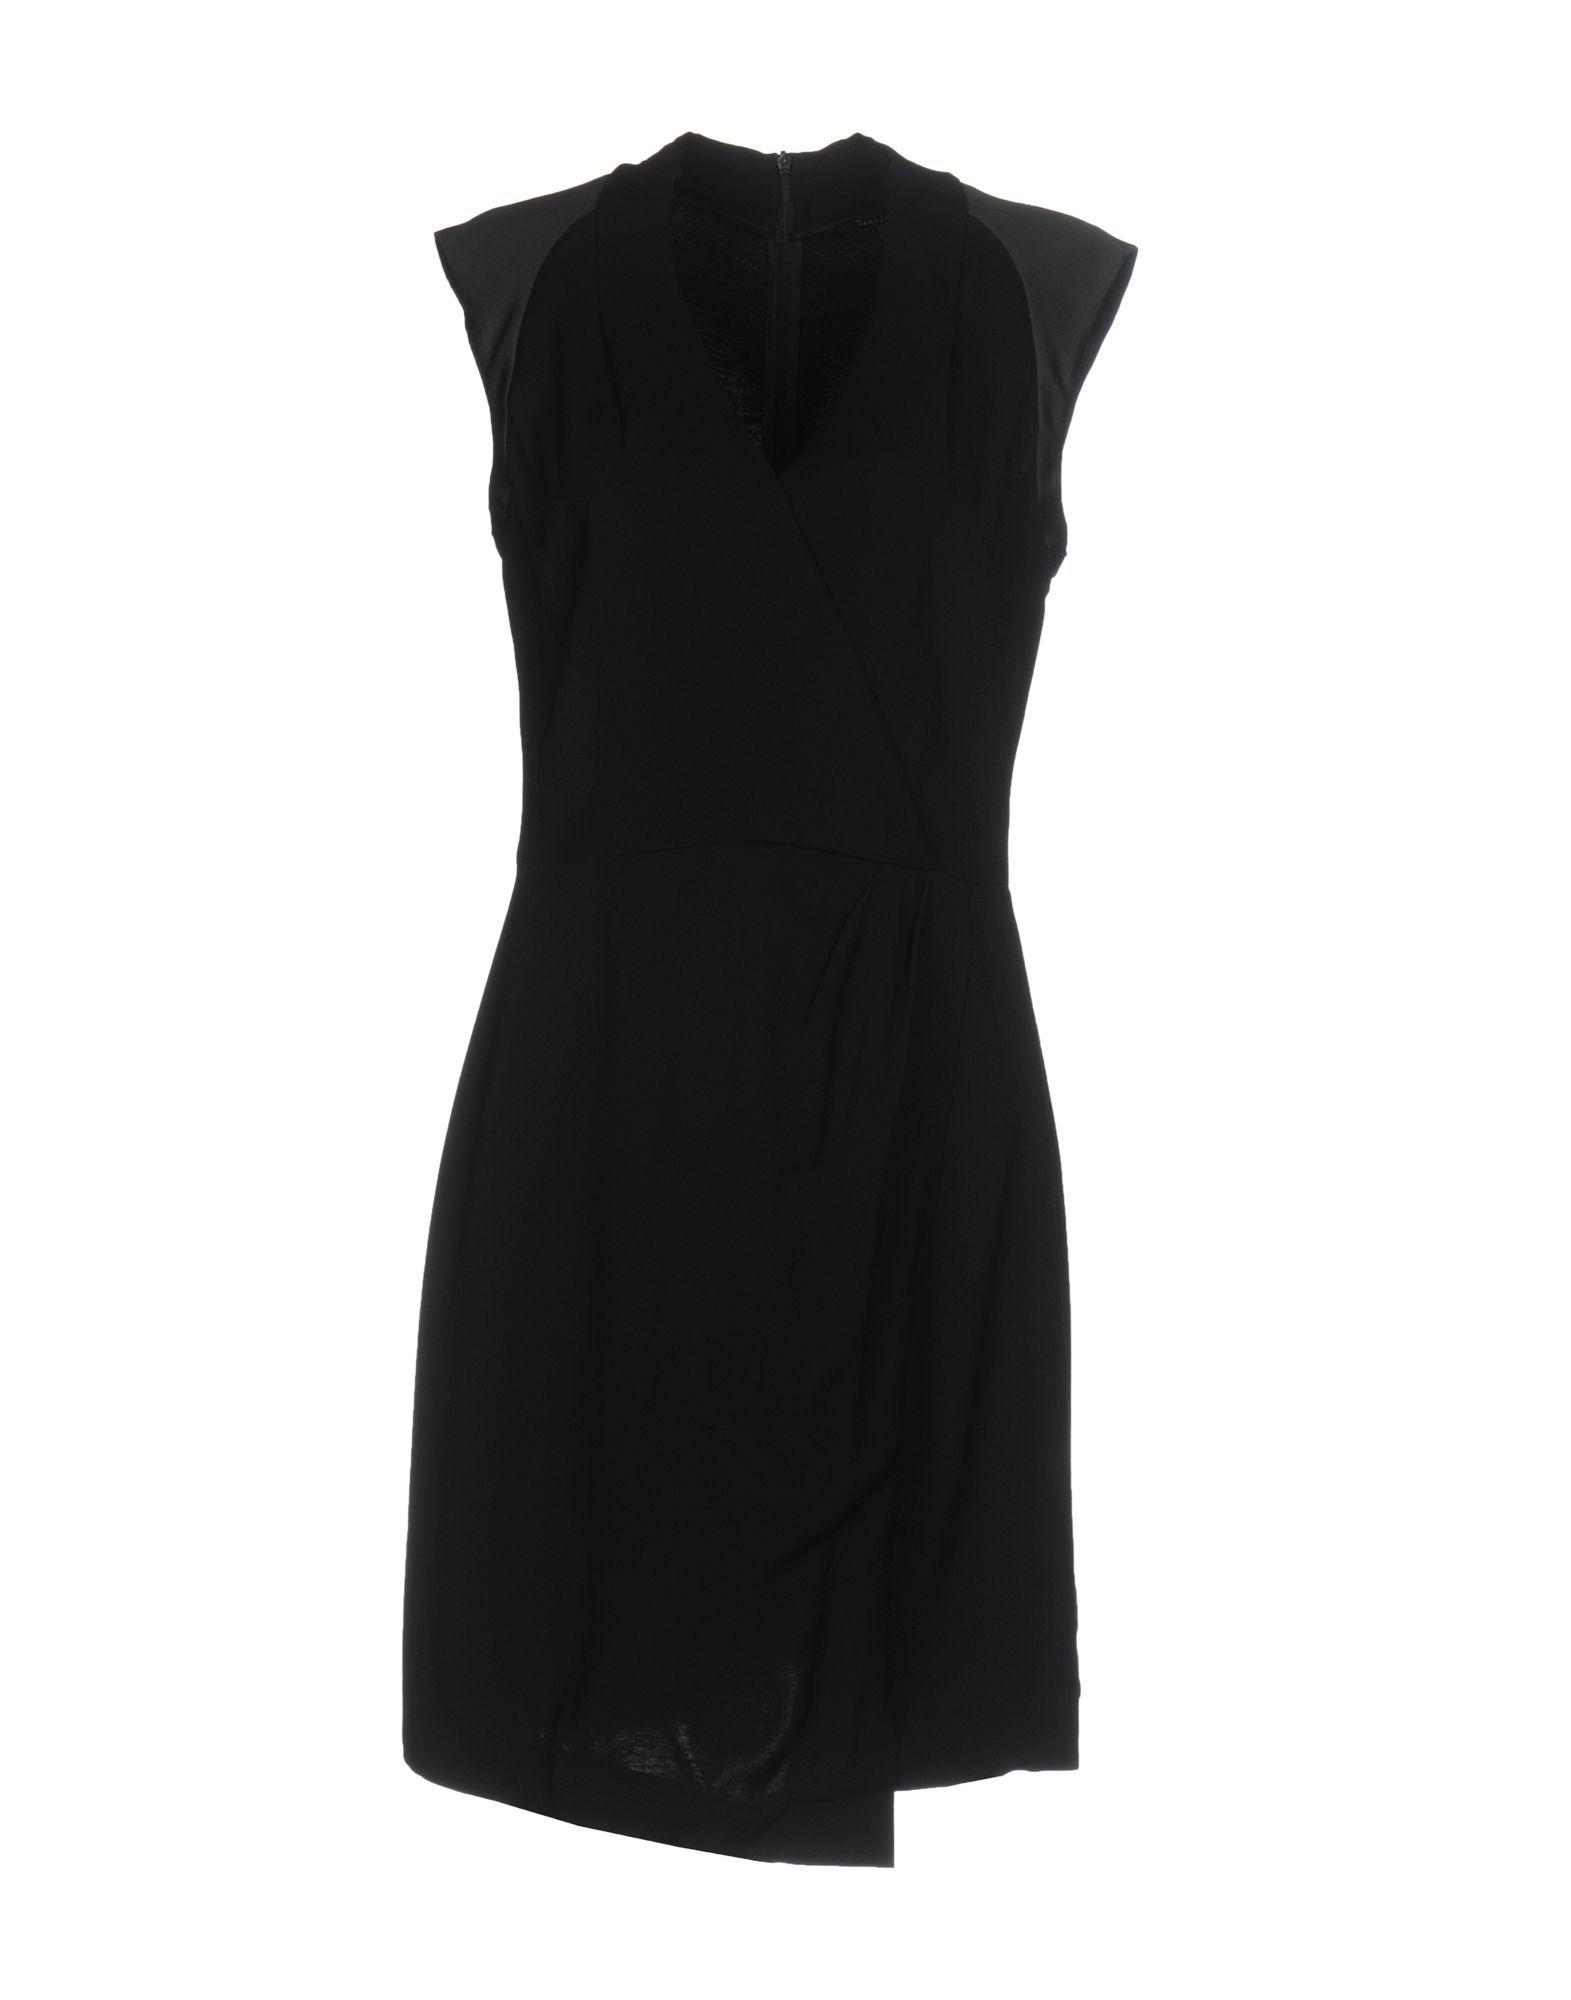 Tara Jarmon Black Crepe Sleeveless Dress